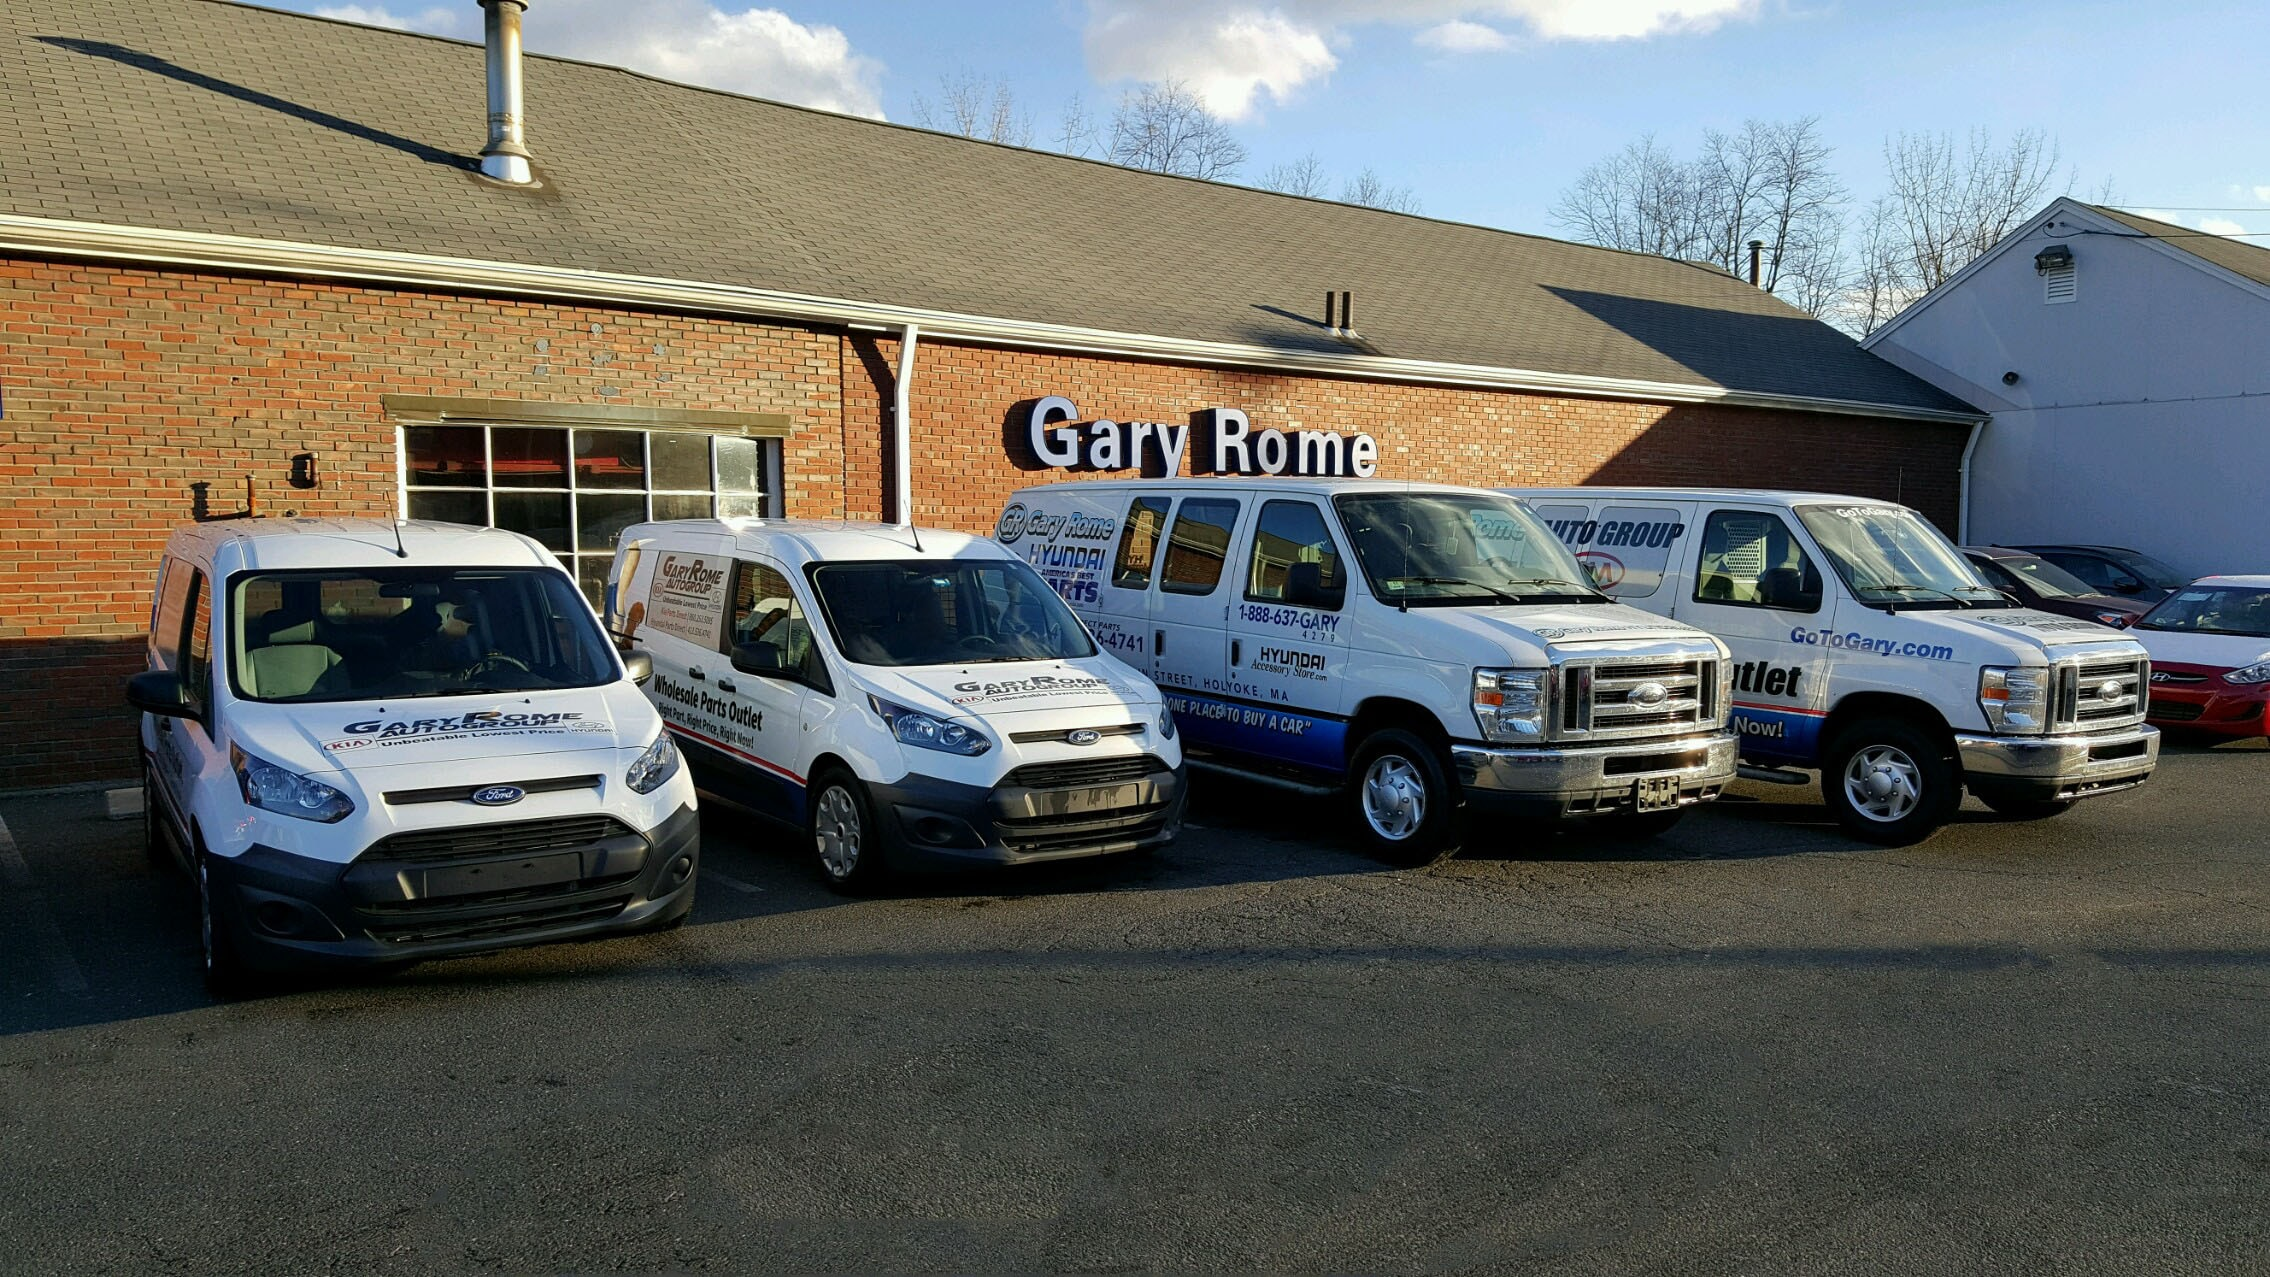 Gary Rome Hyundai New Hyundai Dealership In Holyoke Ma ...